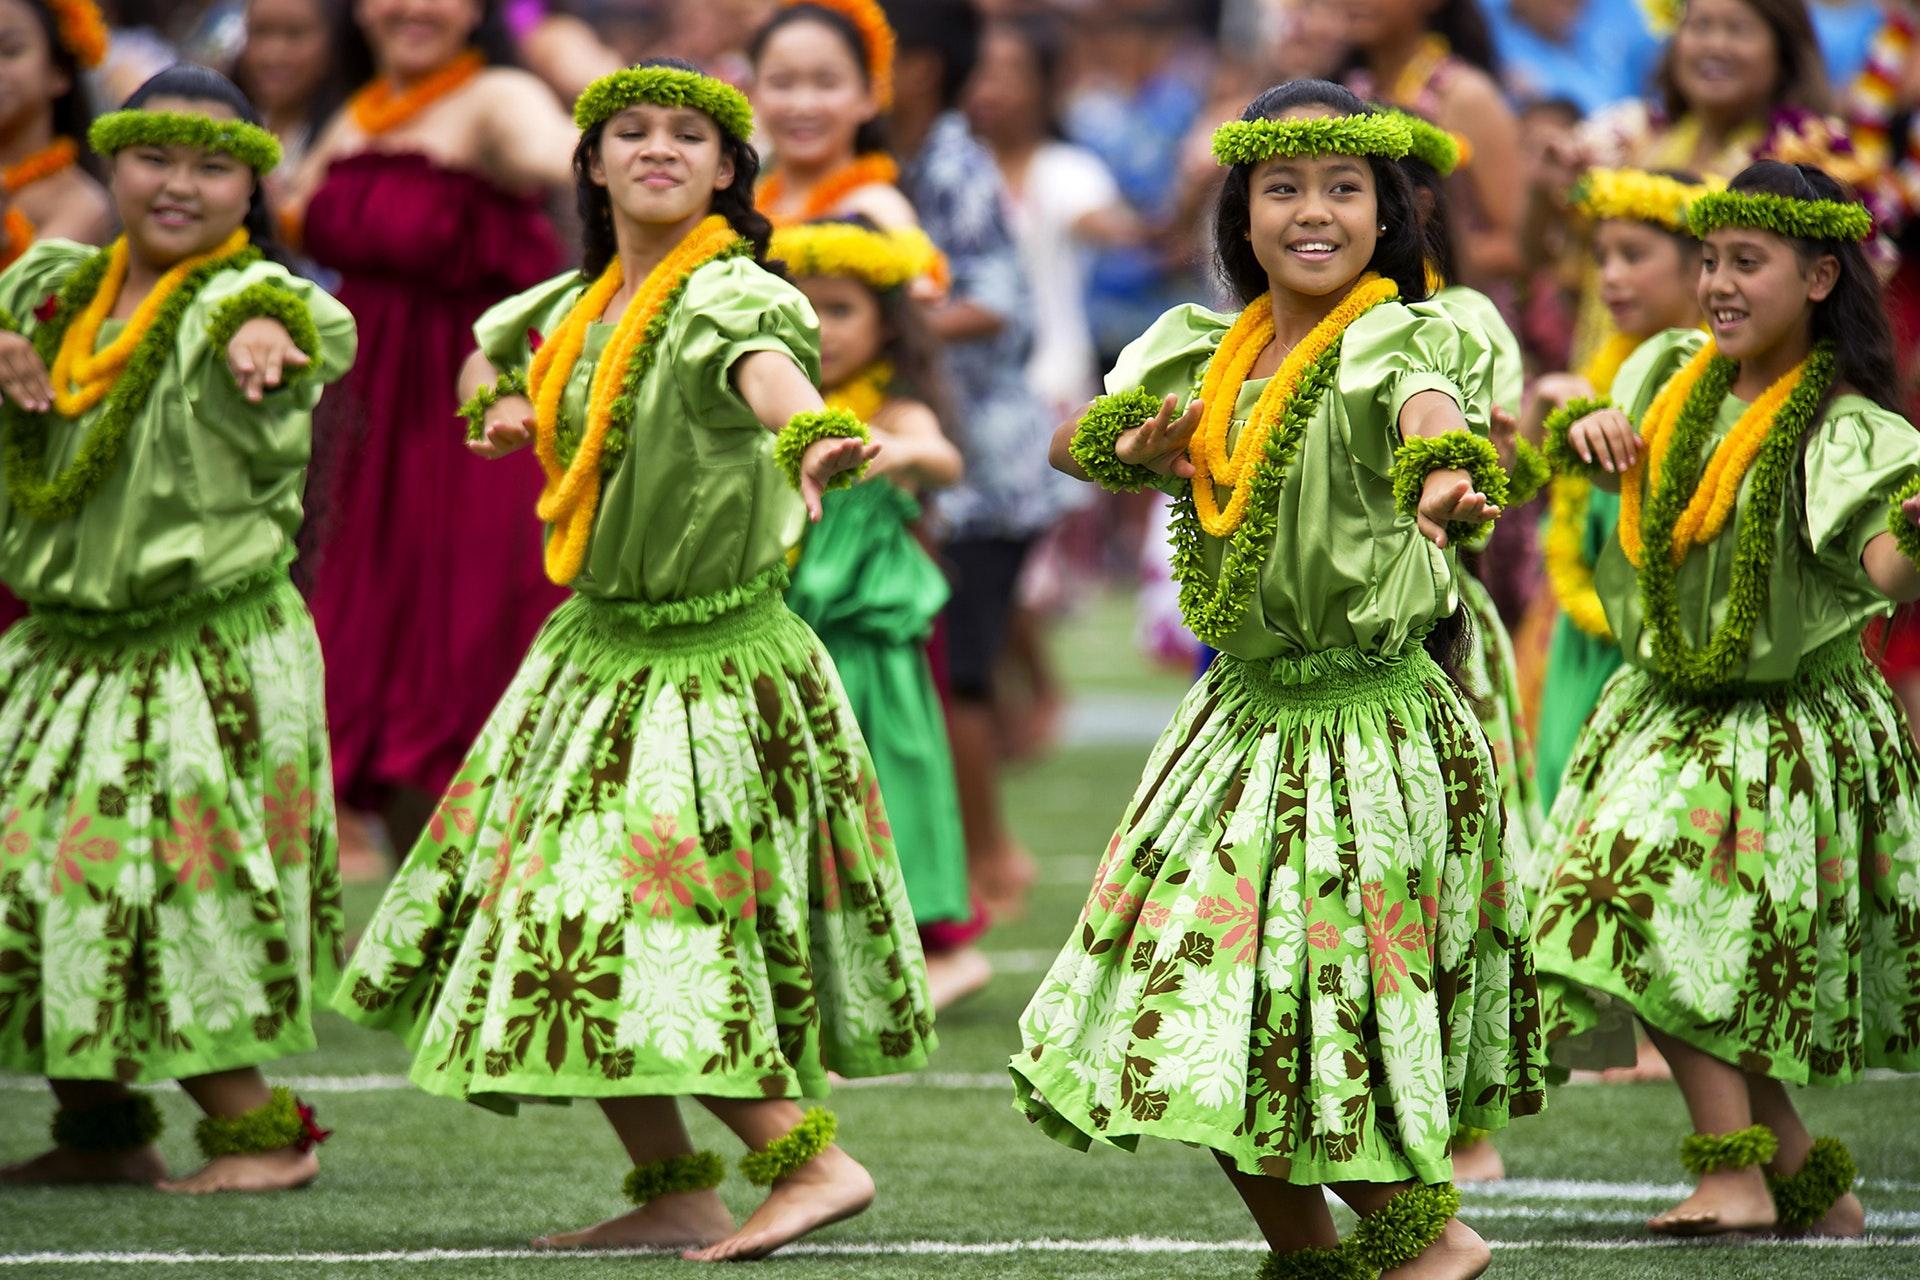 hawaiian-hula-dancers-aloha-stadium-dod-photo-by-usaf-tech-54093.jpeg